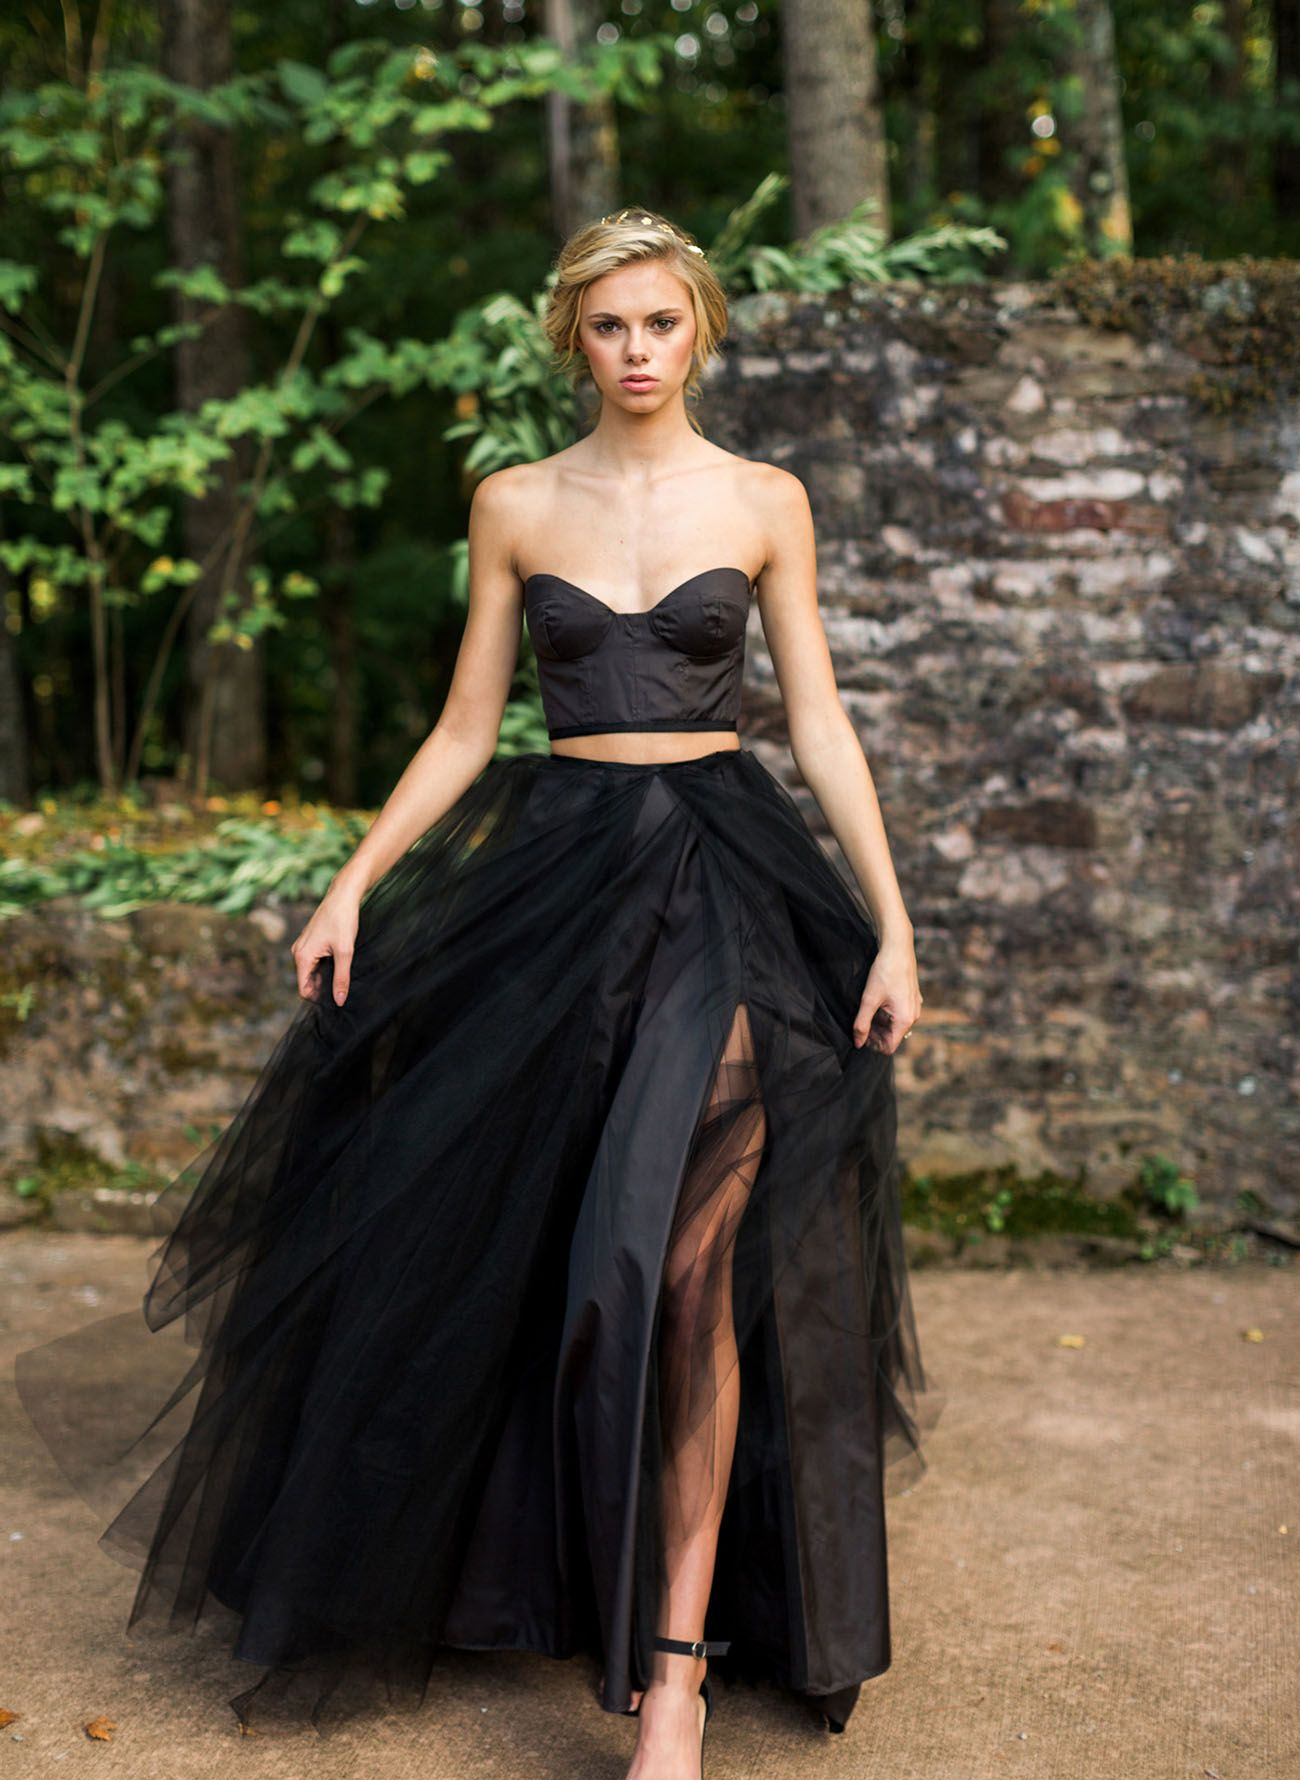 Fall Gothic Bridal Inspiration With A Black Gown Green Wedding Shoes Black Wedding Dresses Wedding Skirt Bridal Shower Dress [ 1780 x 1300 Pixel ]